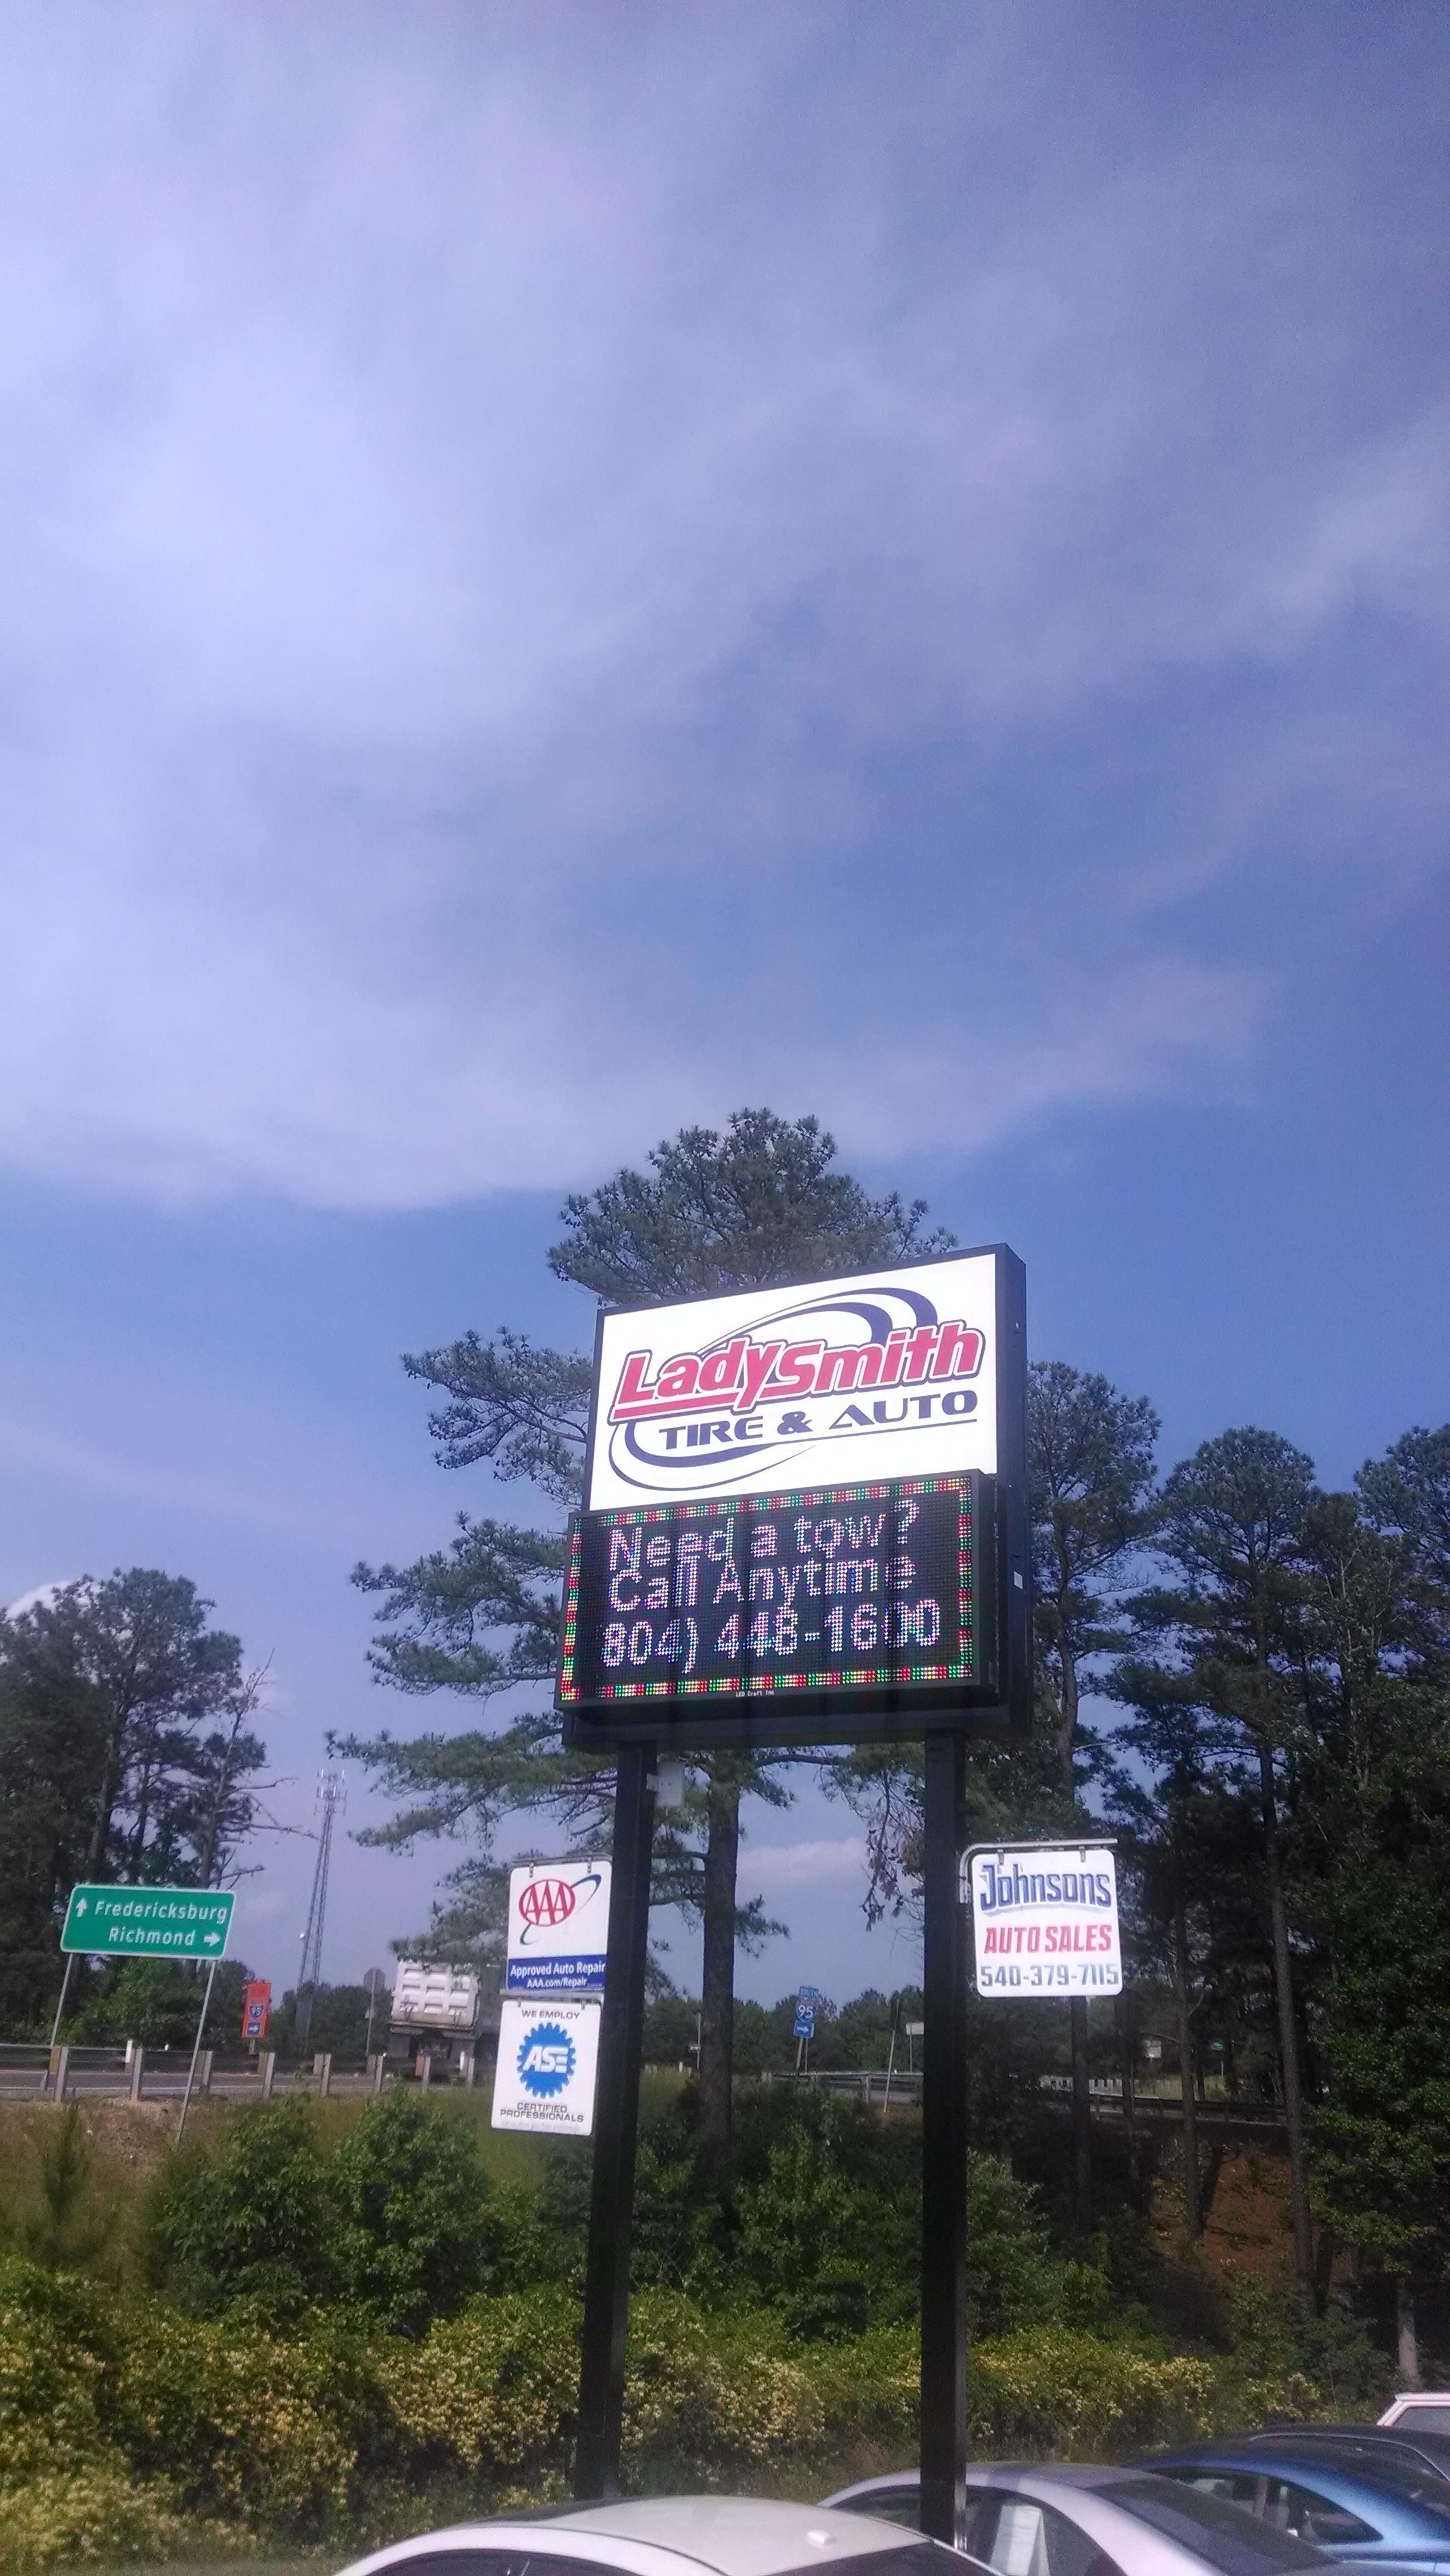 Ladysmith Tire & Auto